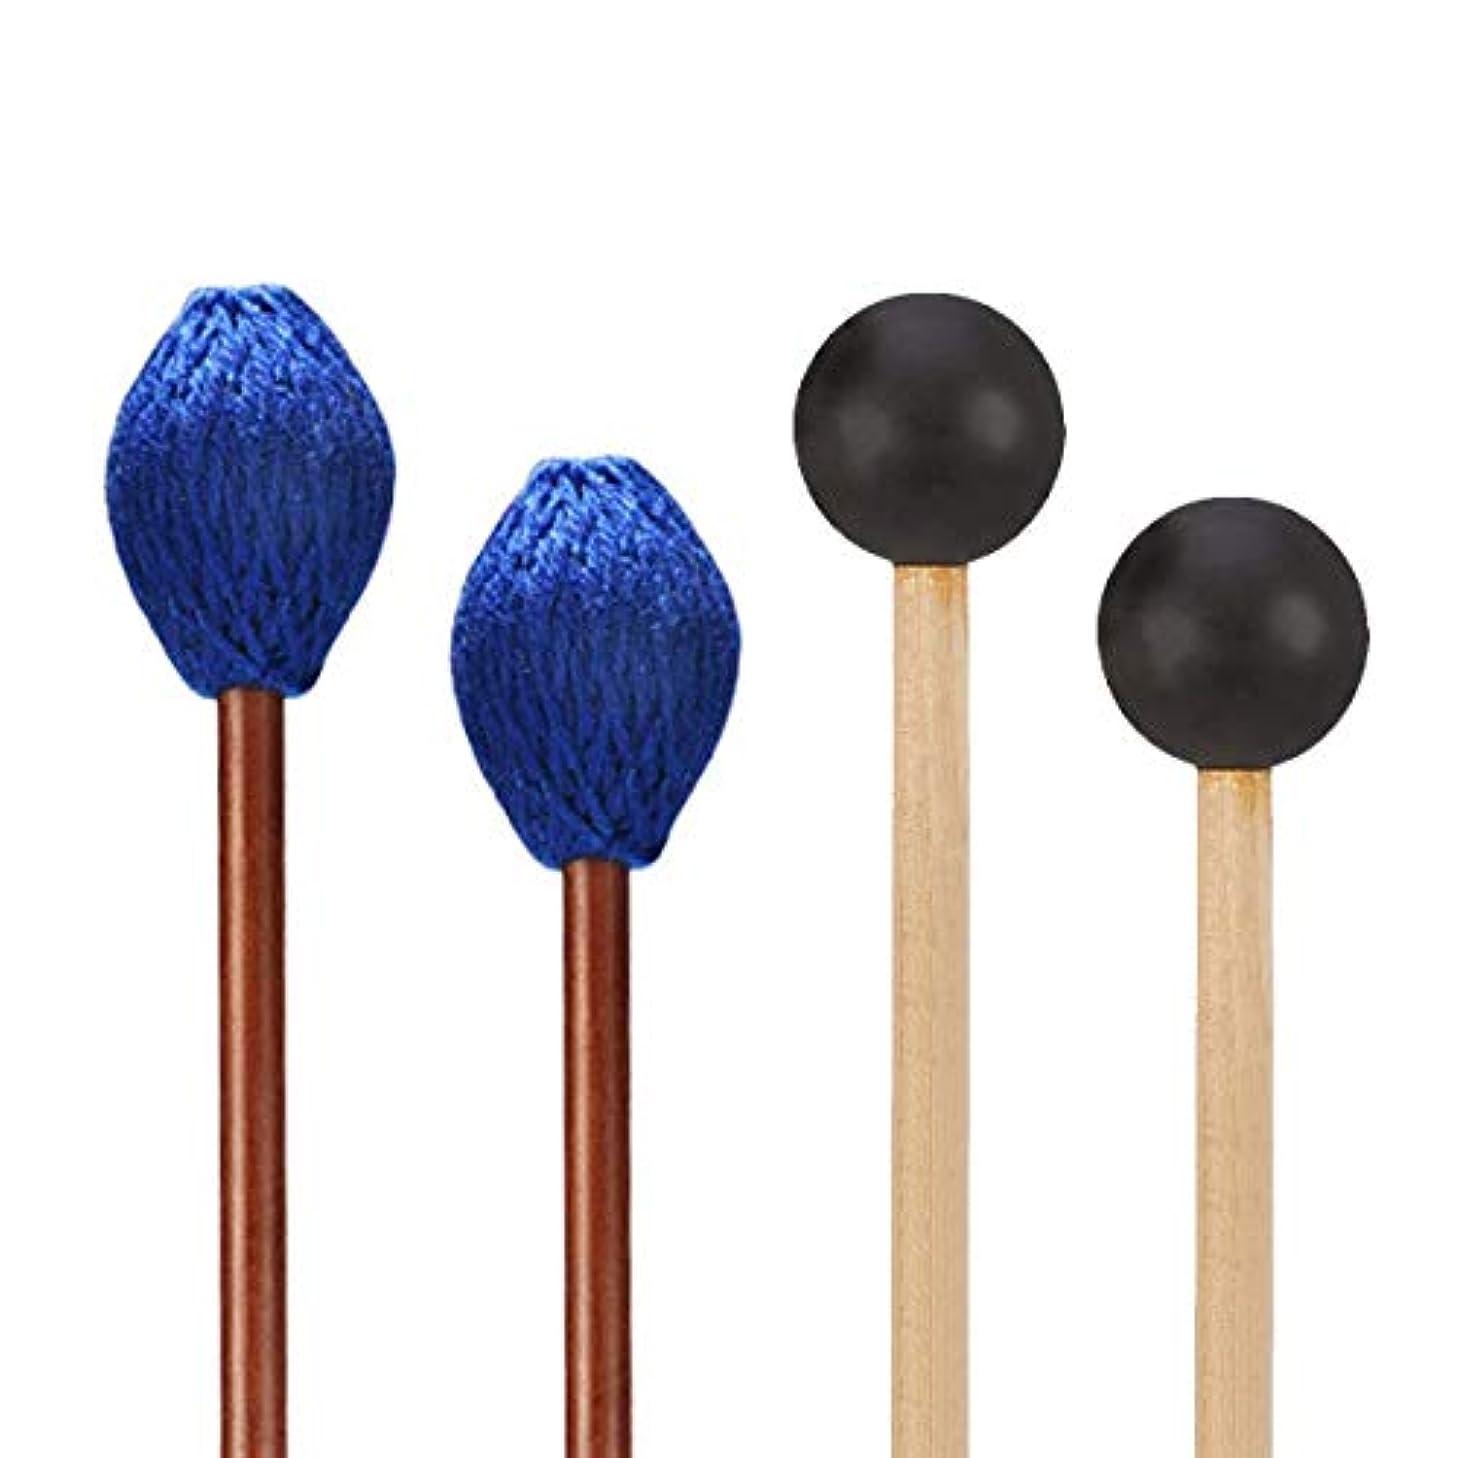 1 Pair Medium Hard Yarn Head Marimba Mallets and 1 Pair Rubber Mallets Sticks with Wood Handle for Percussion Bell Glockenspiel Marimba